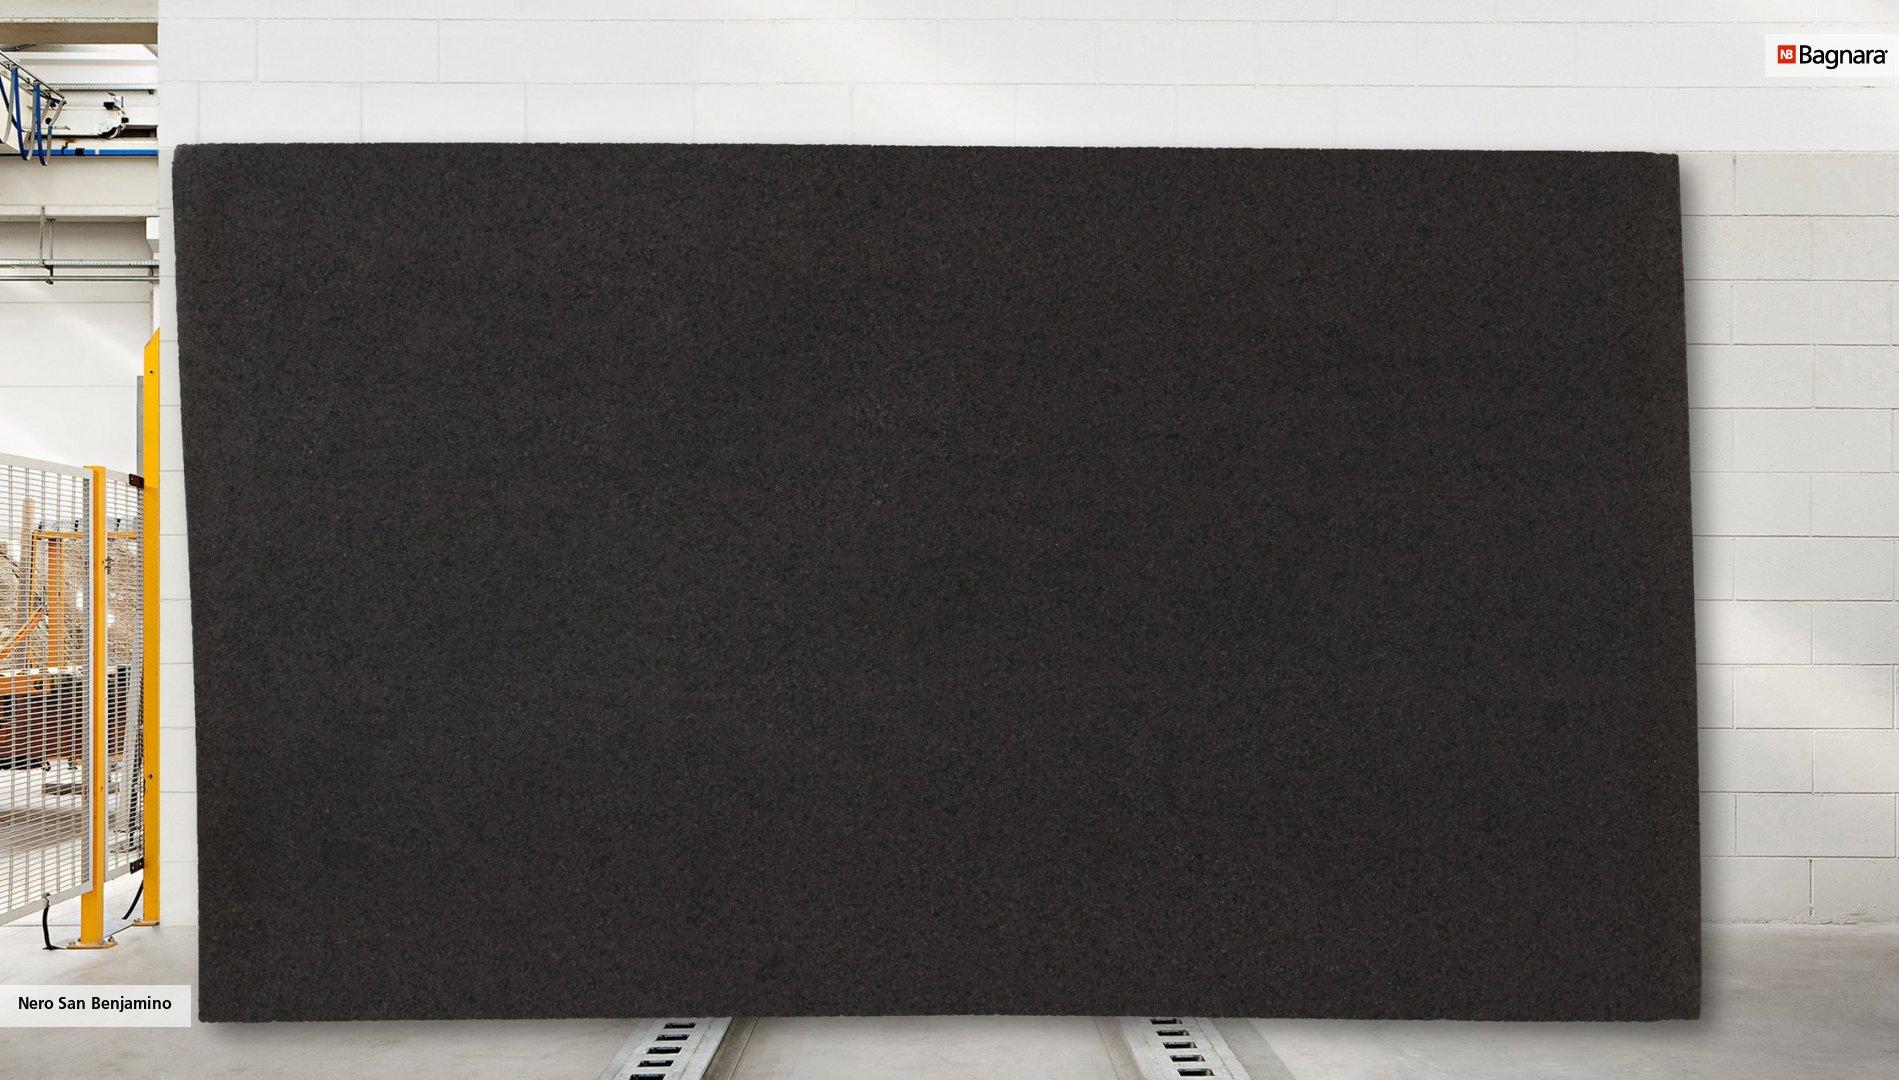 nero san benjamino bagnara. Black Bedroom Furniture Sets. Home Design Ideas